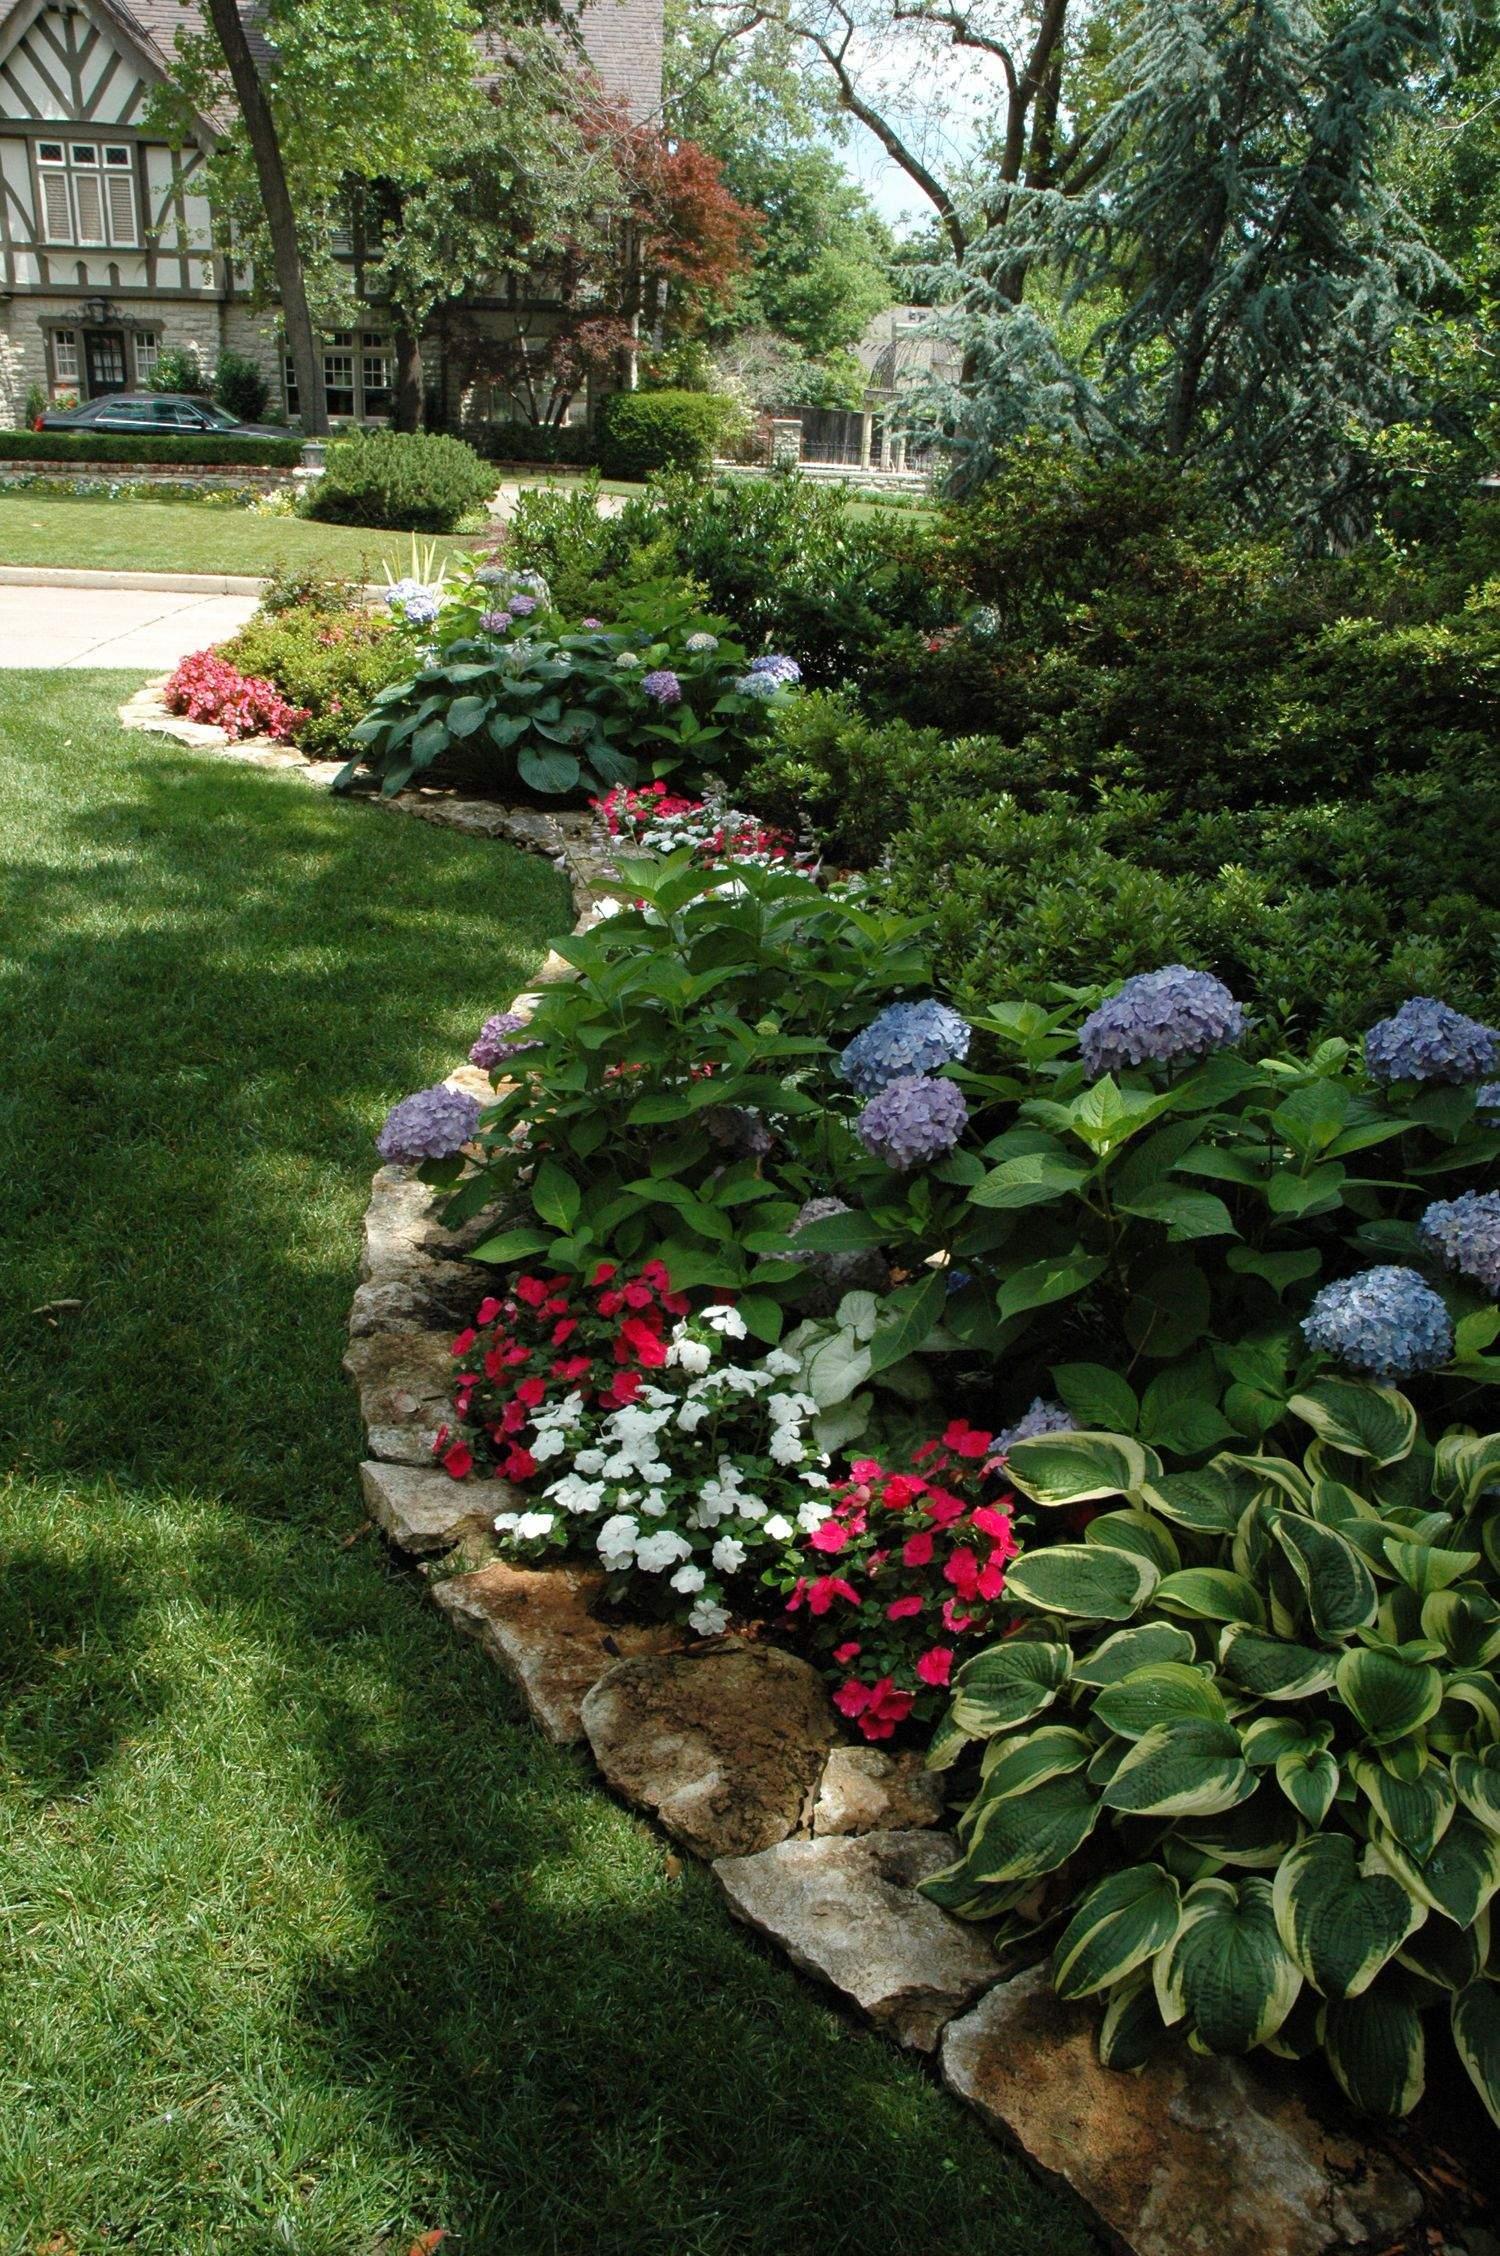 Asiatischer Garten Best Of 27 Reizend Hangsicherung Garten Luxus